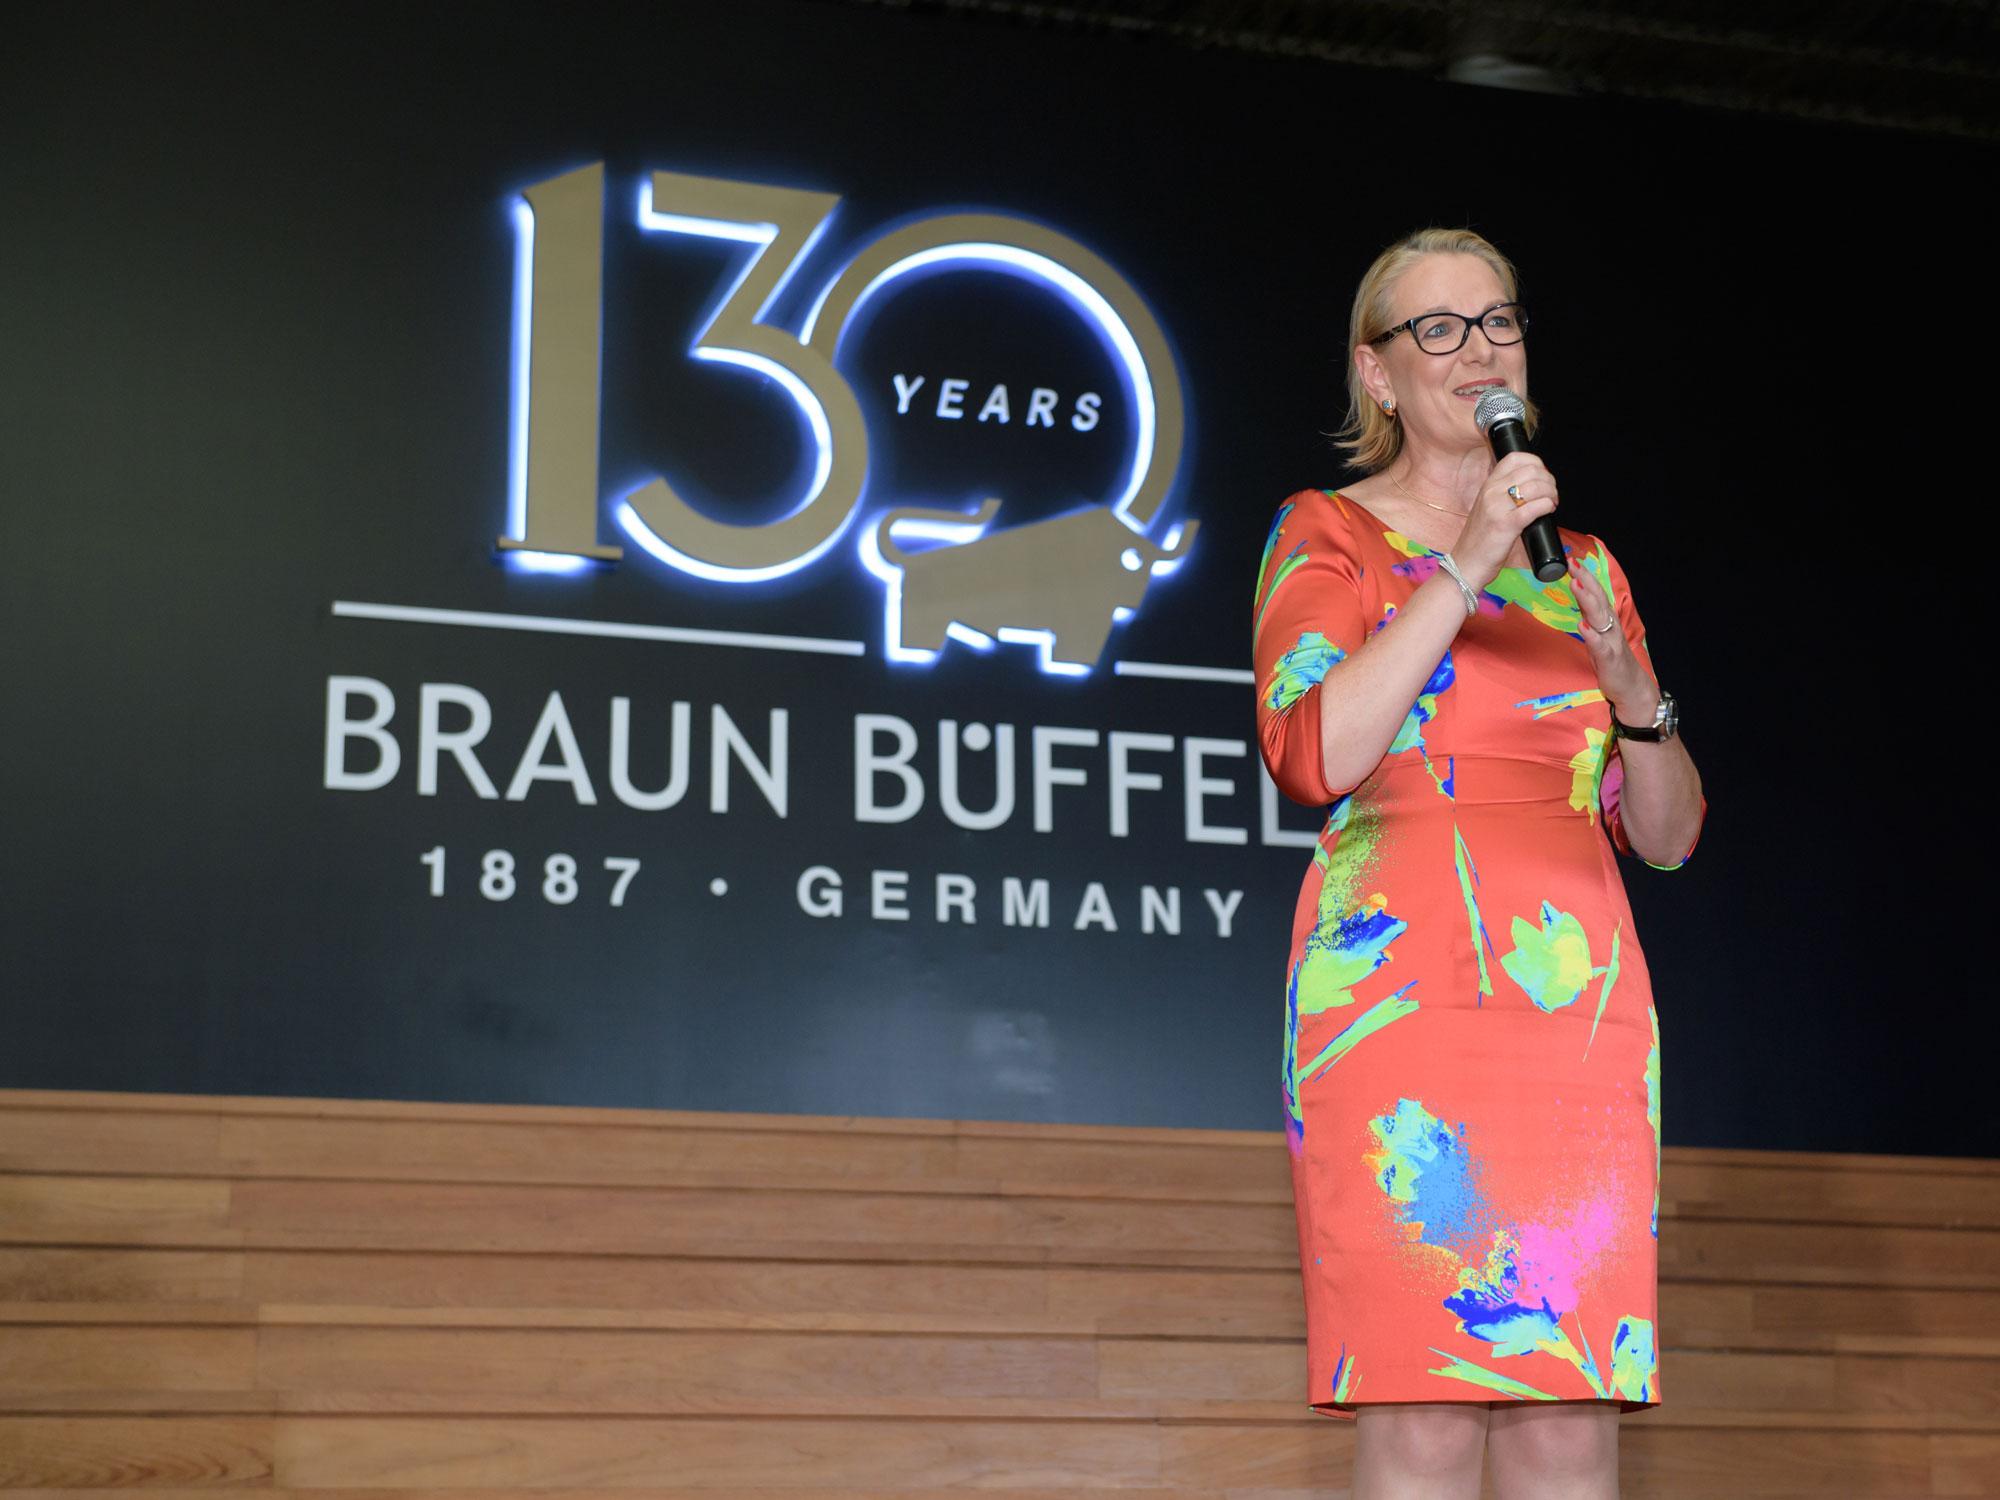 130 Tahun Braun Buffel